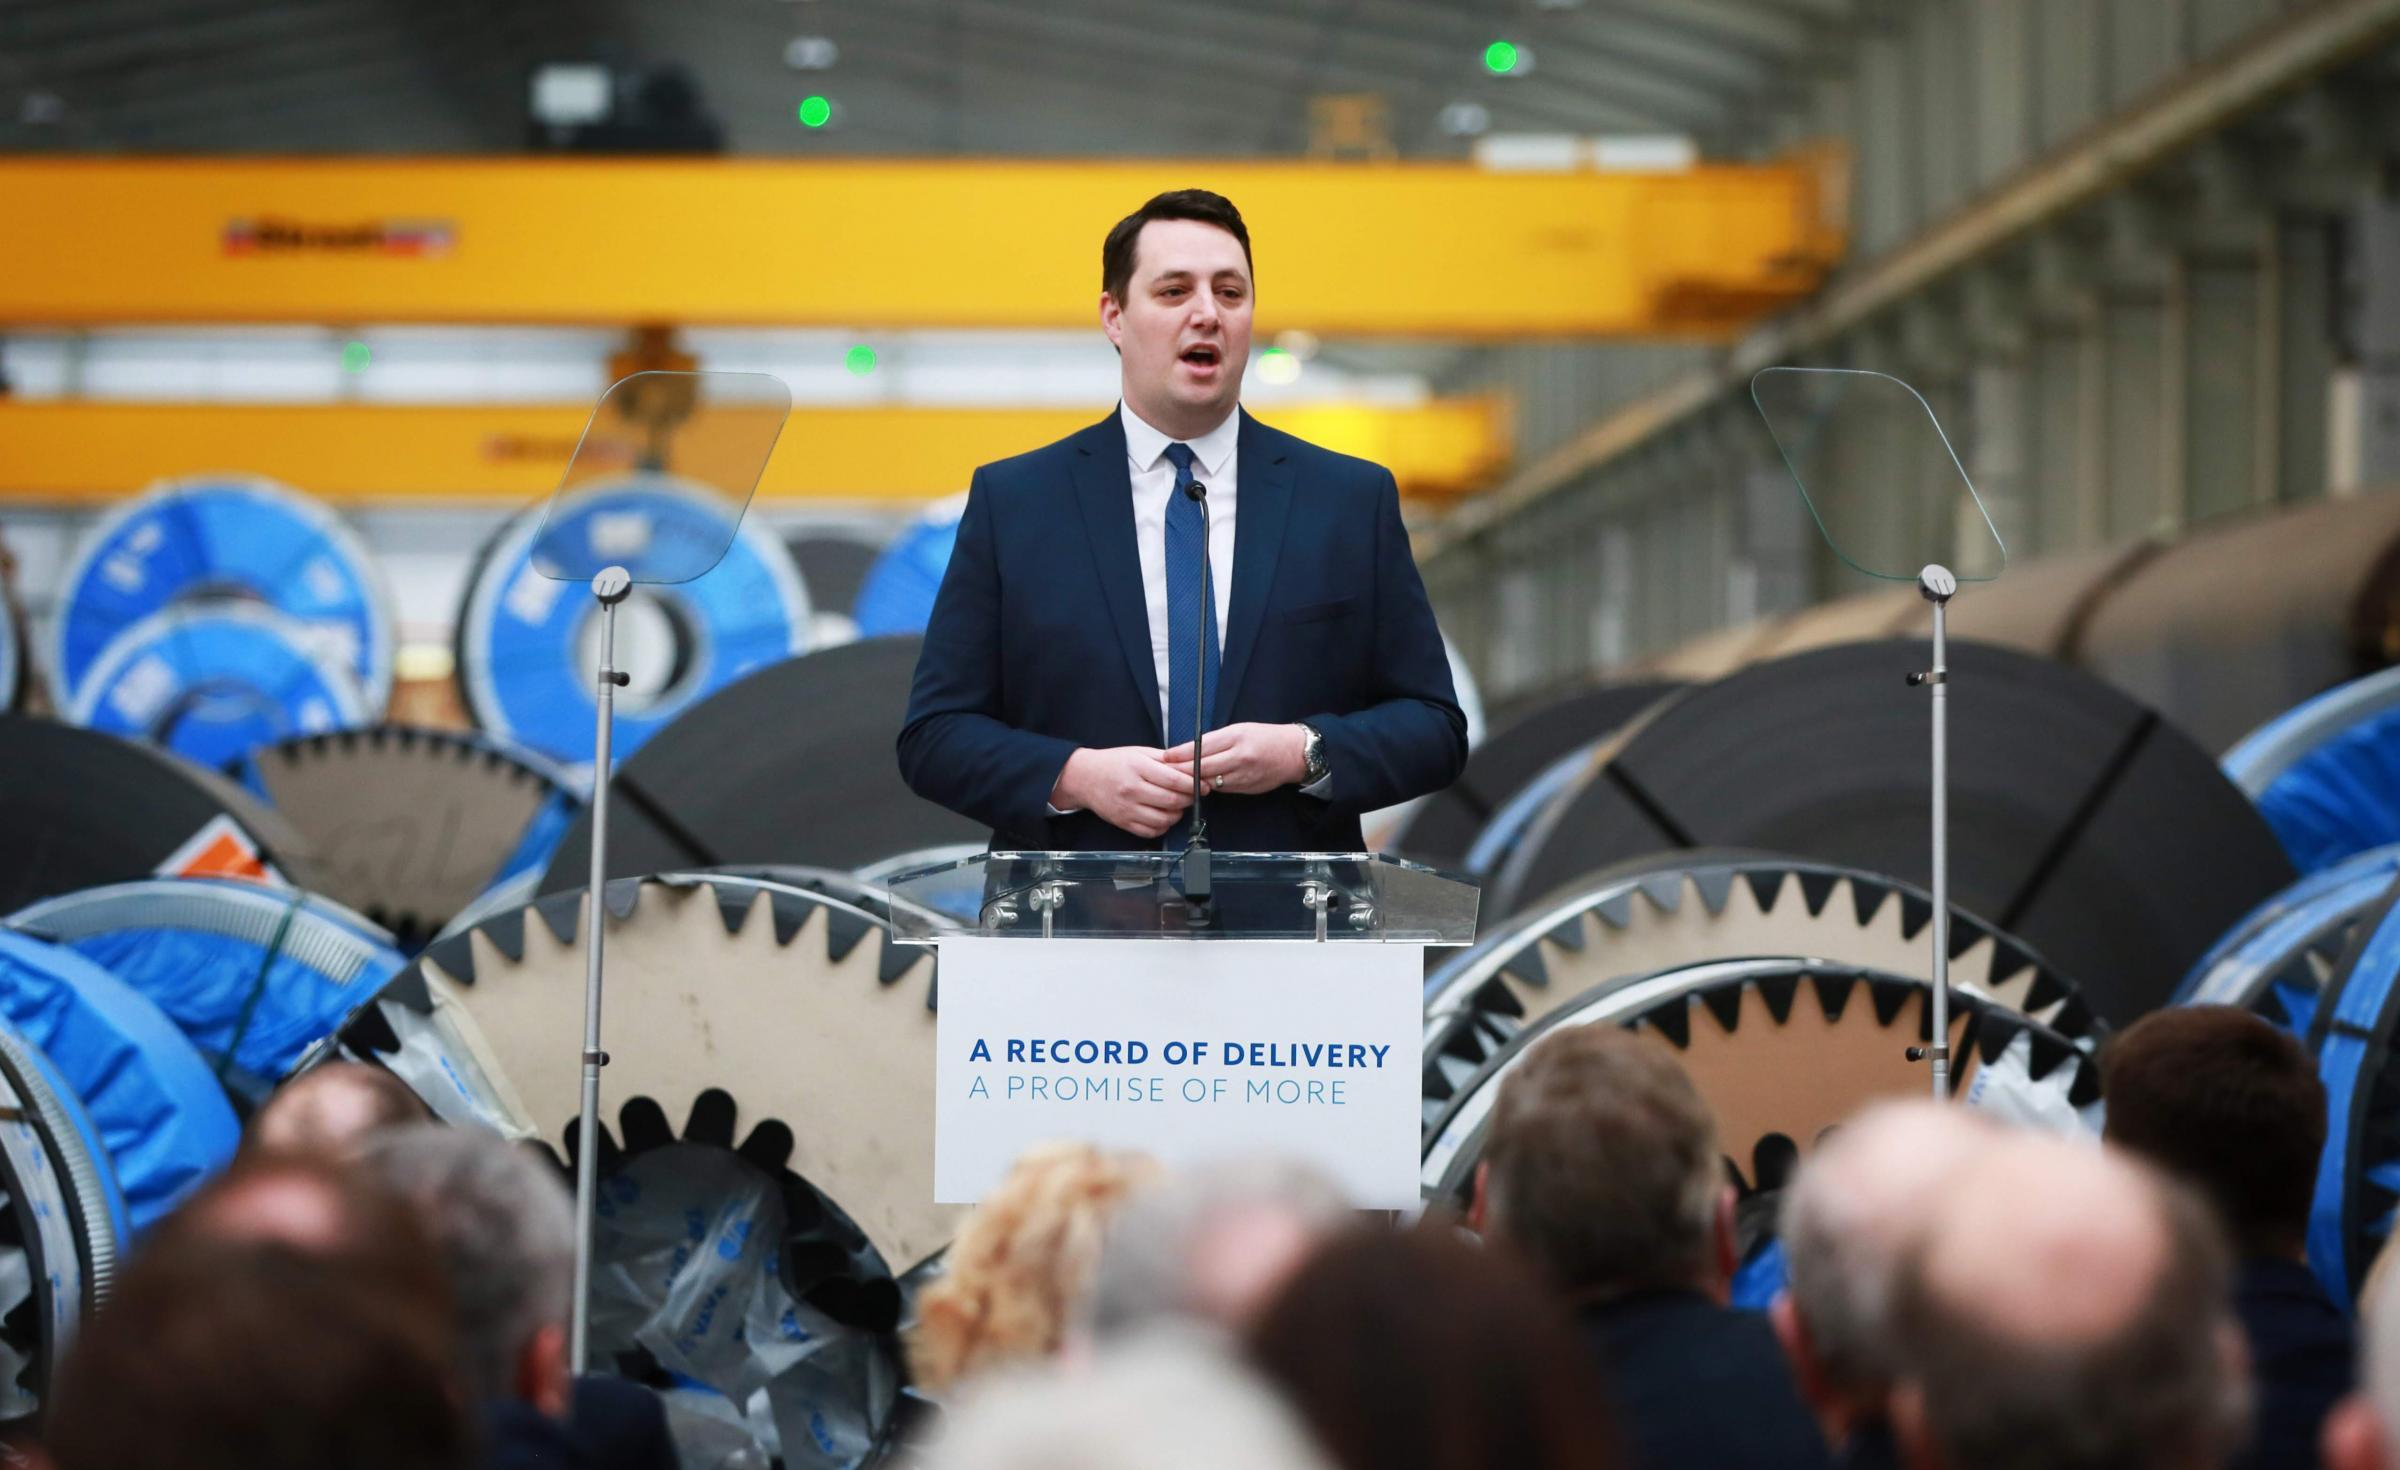 Ben Houchen:  My ask of Rishi Sunak - A Teesside Freeport & Darlington Treasury jobs